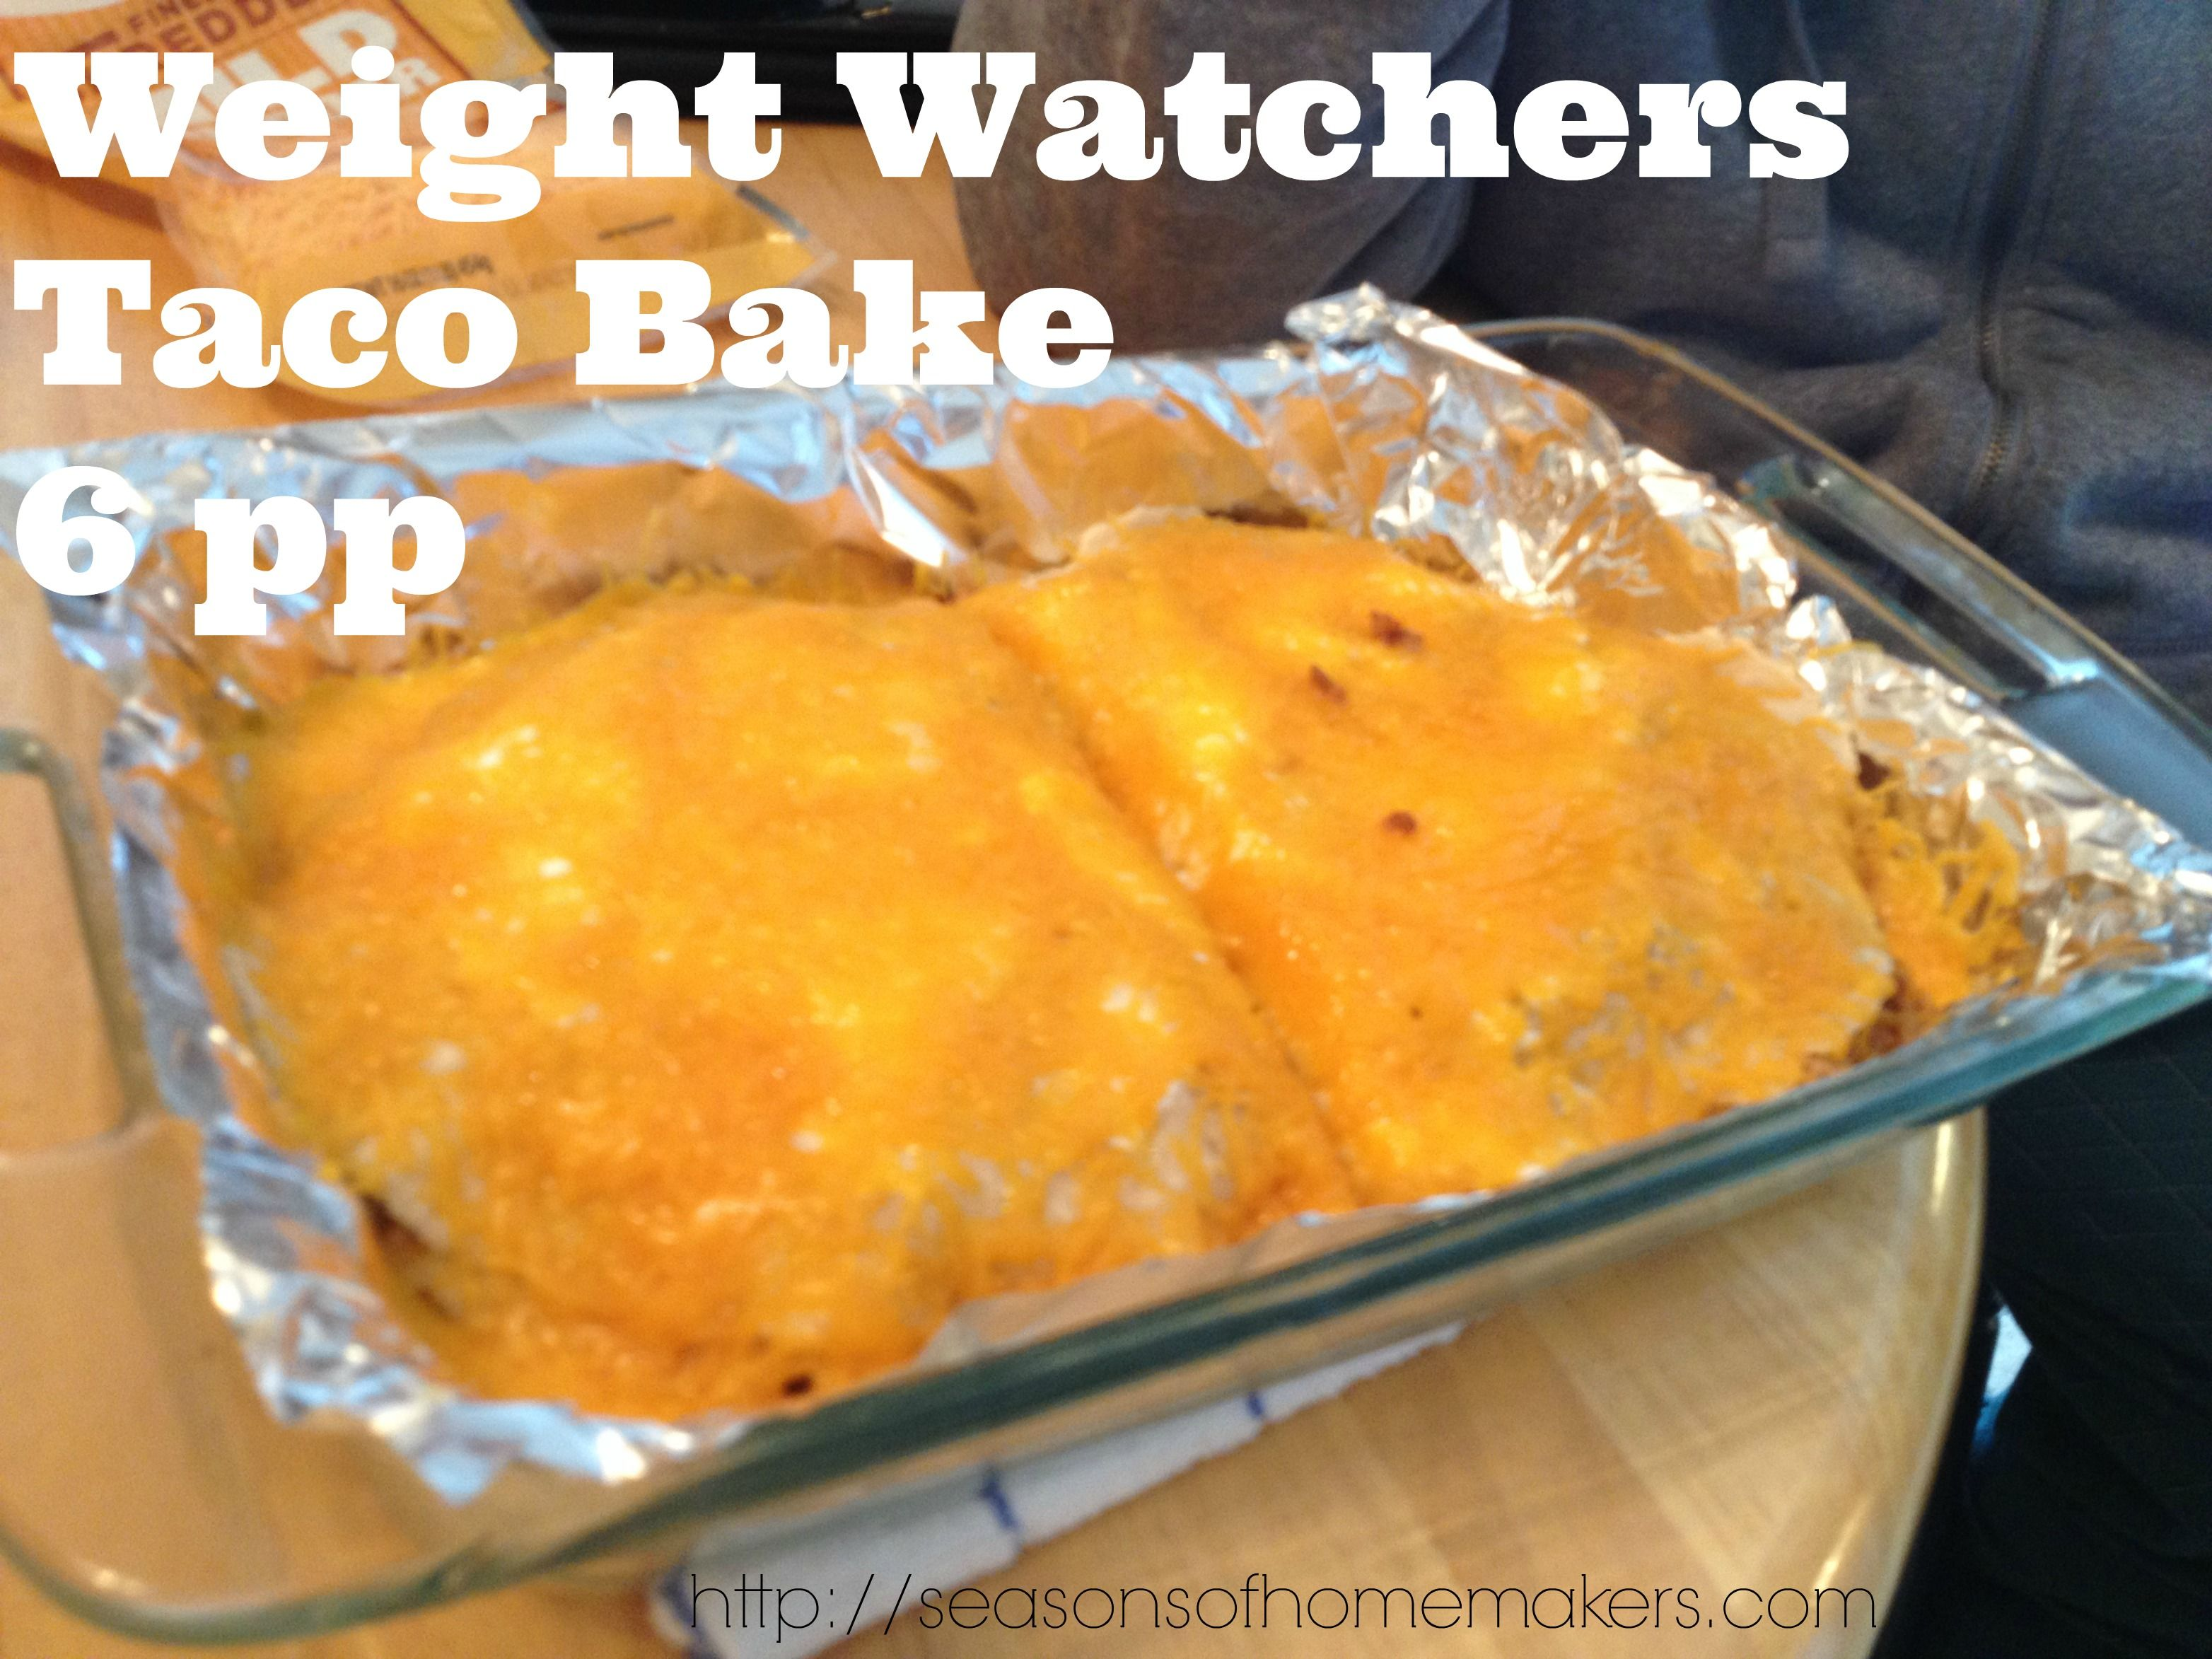 Taco Bake (6pp) on MyRecipeMagic.com